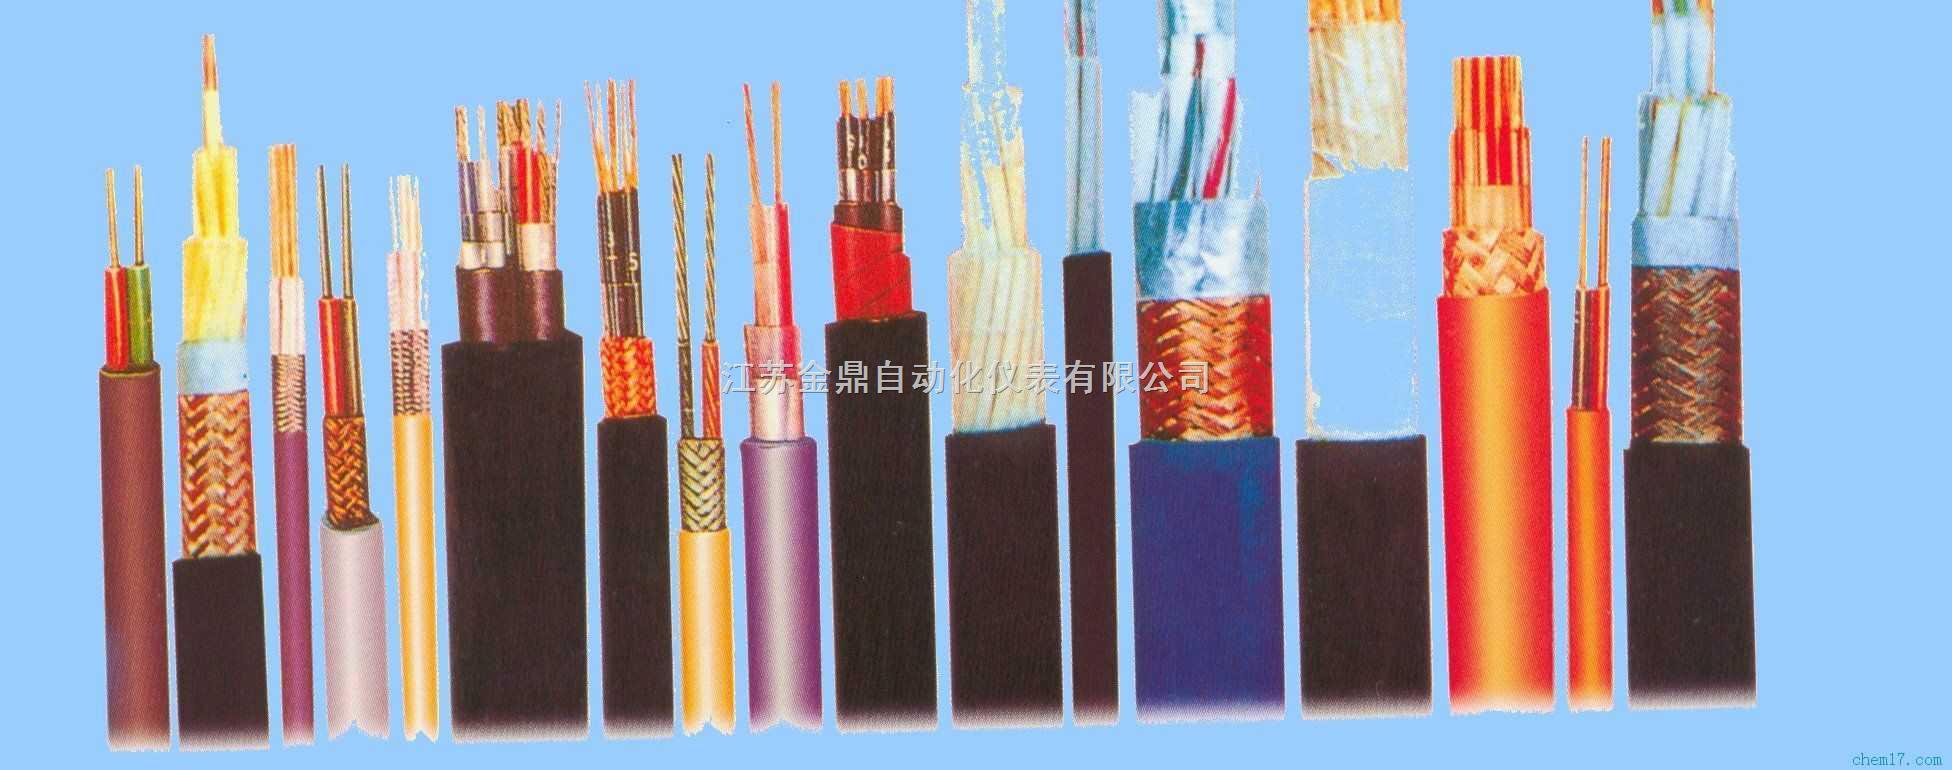 kc_sc_kx_ex_rx熱電偶補償導線廠家_補償導線規格選型_補償導線價格圖片